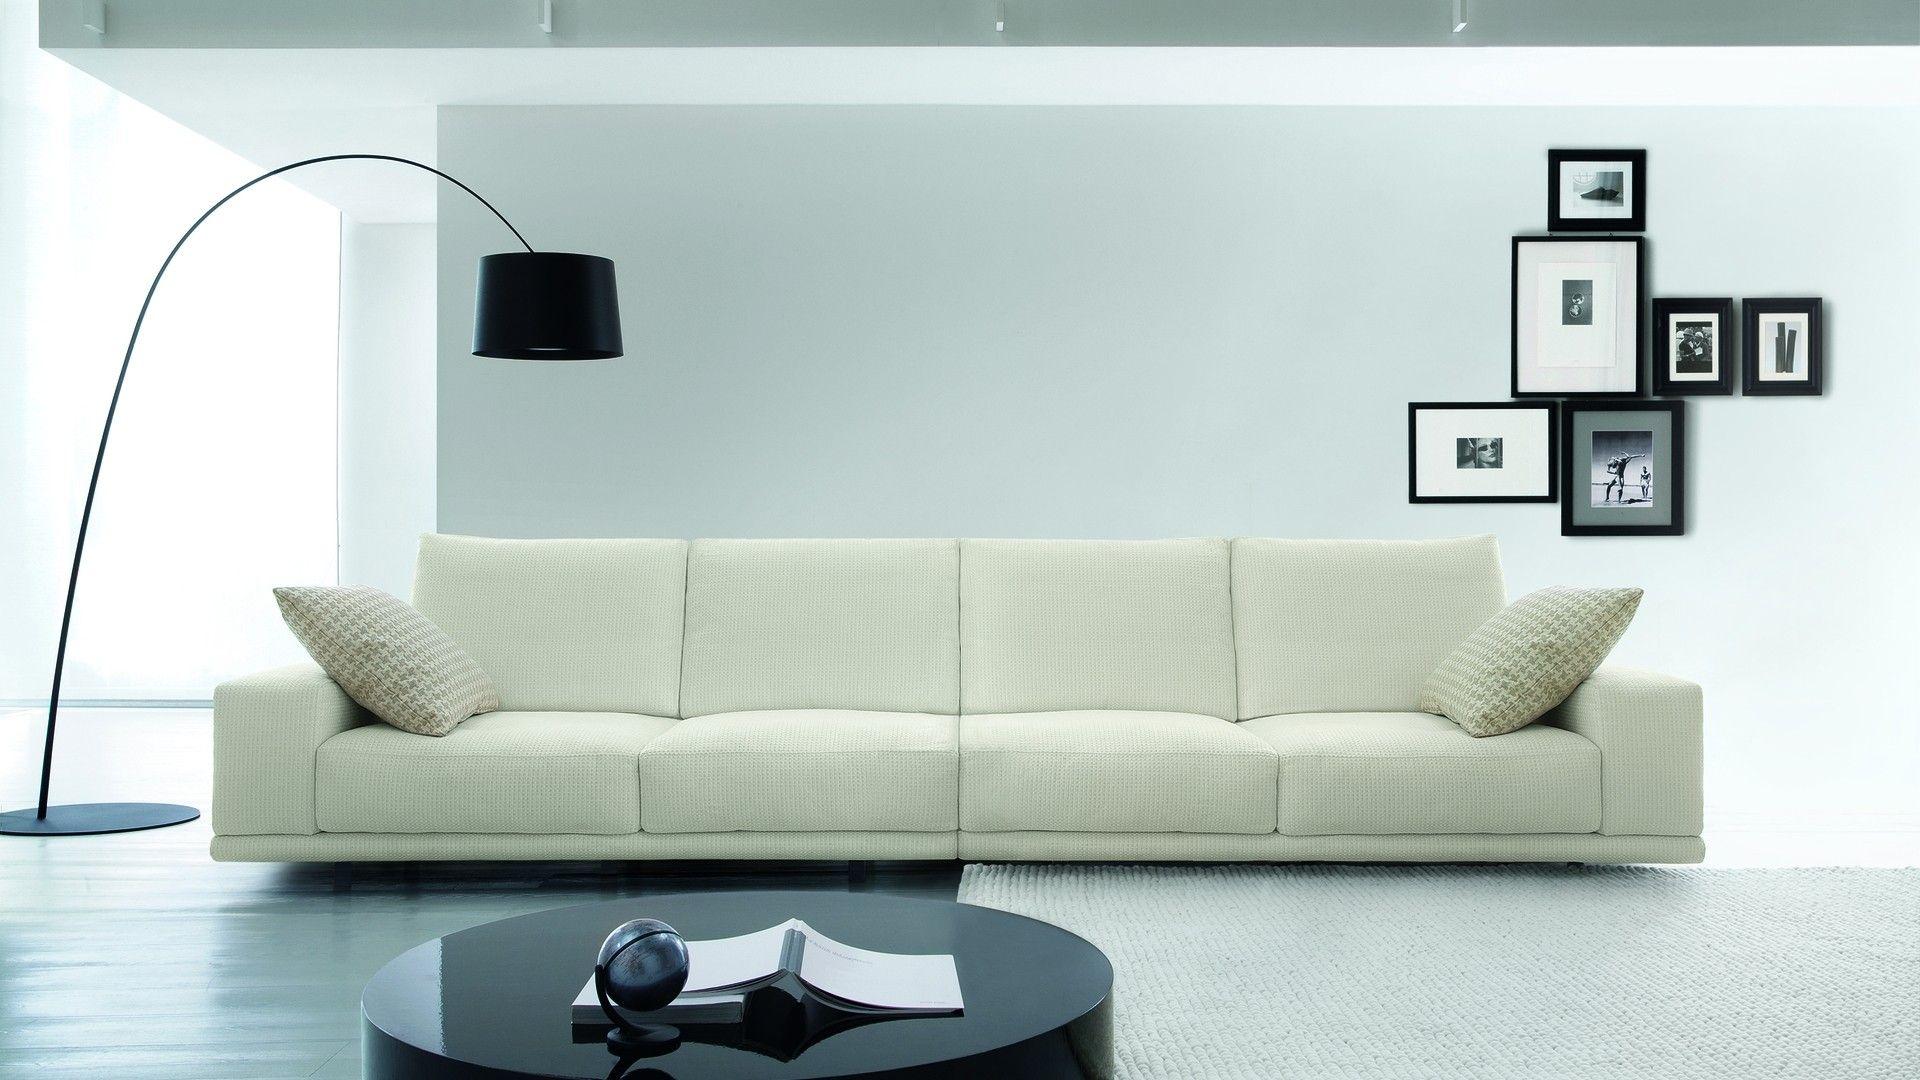 Interior Living Room 1920x1080 Wallpaper Stylish Living Room Living Room Modern Furniture Living room ny lyrics